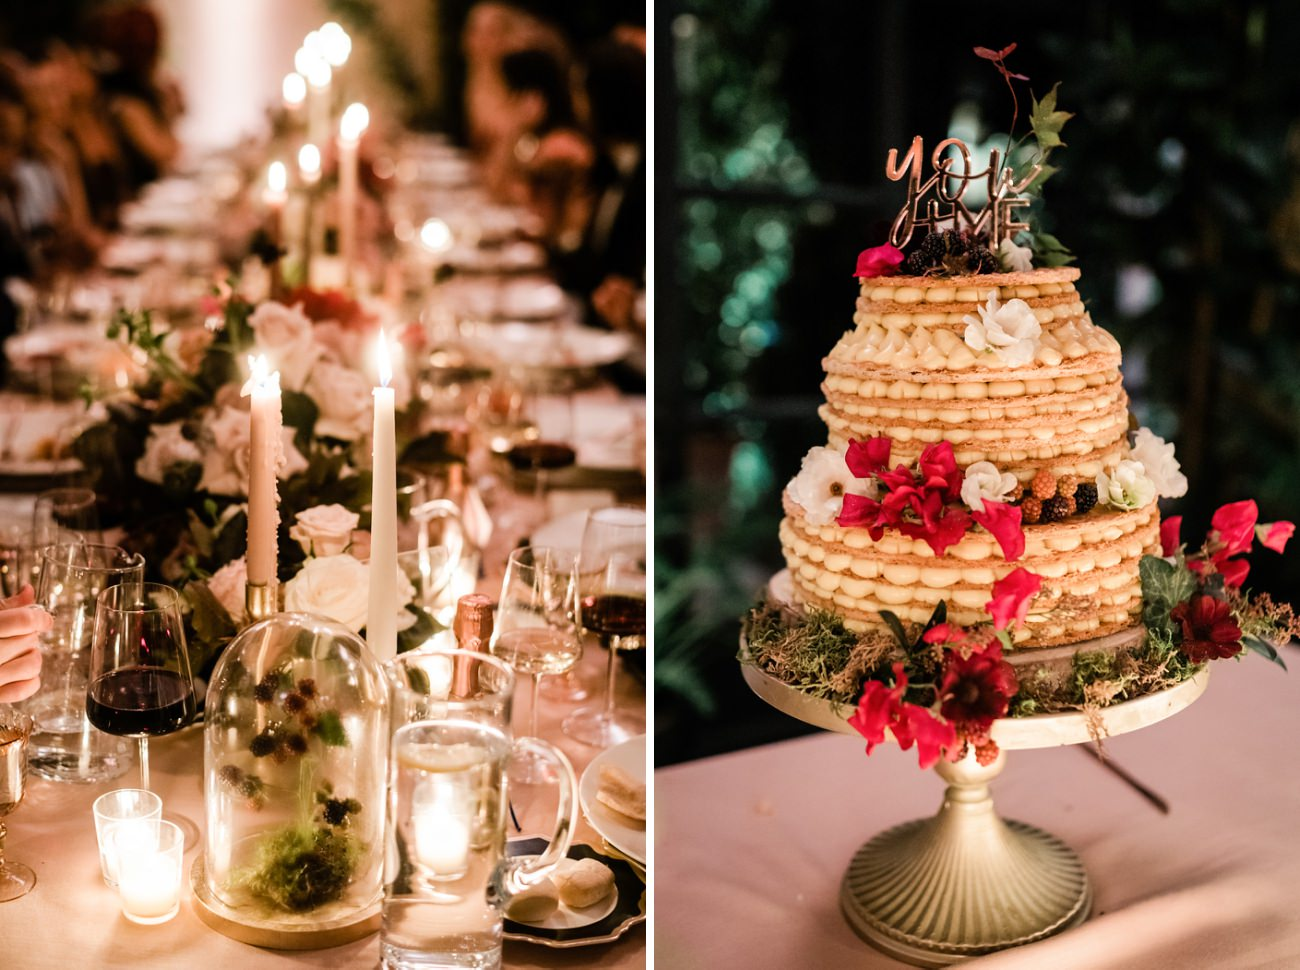 A Rose-Gold Fantasy / A Night Wedding Villa del Balbianello Lake Como